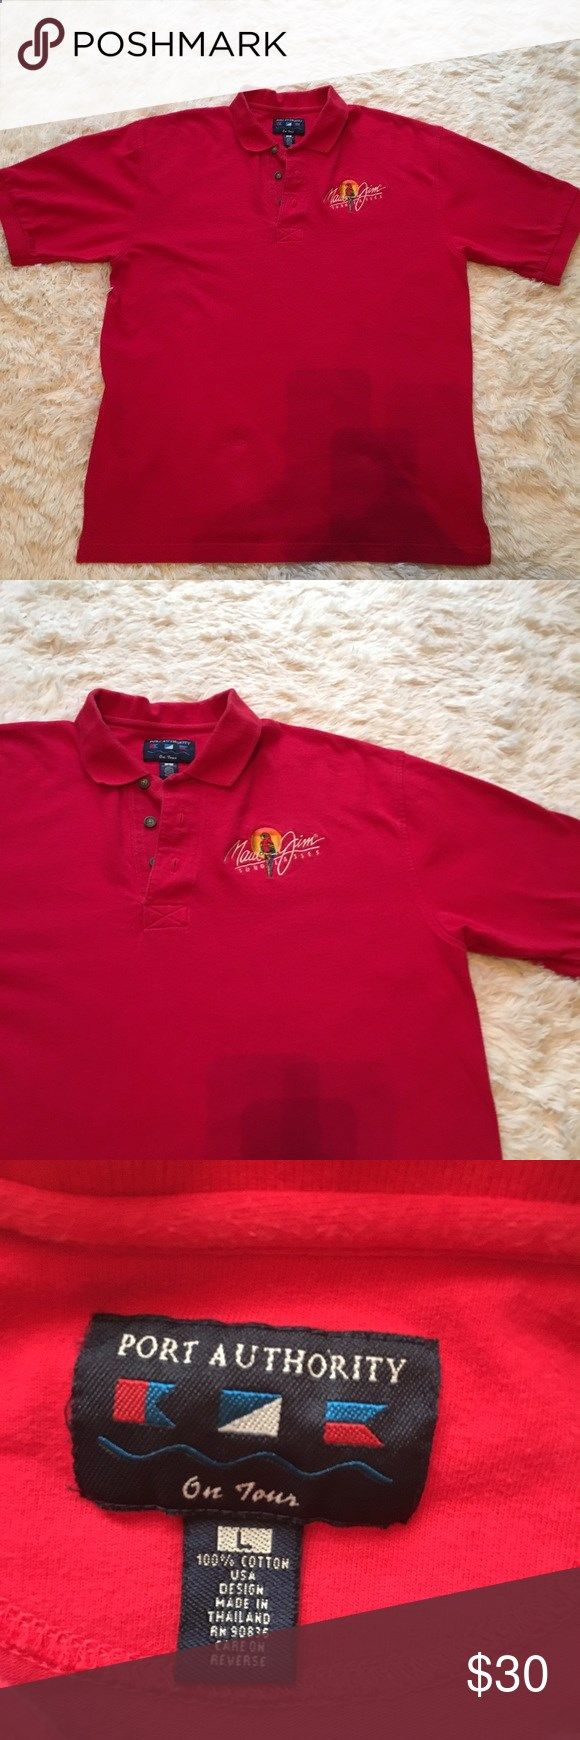 Golf Shirts - Maui Jim golf shirt Maui Jim red golf shirt/100% cotton Shirts